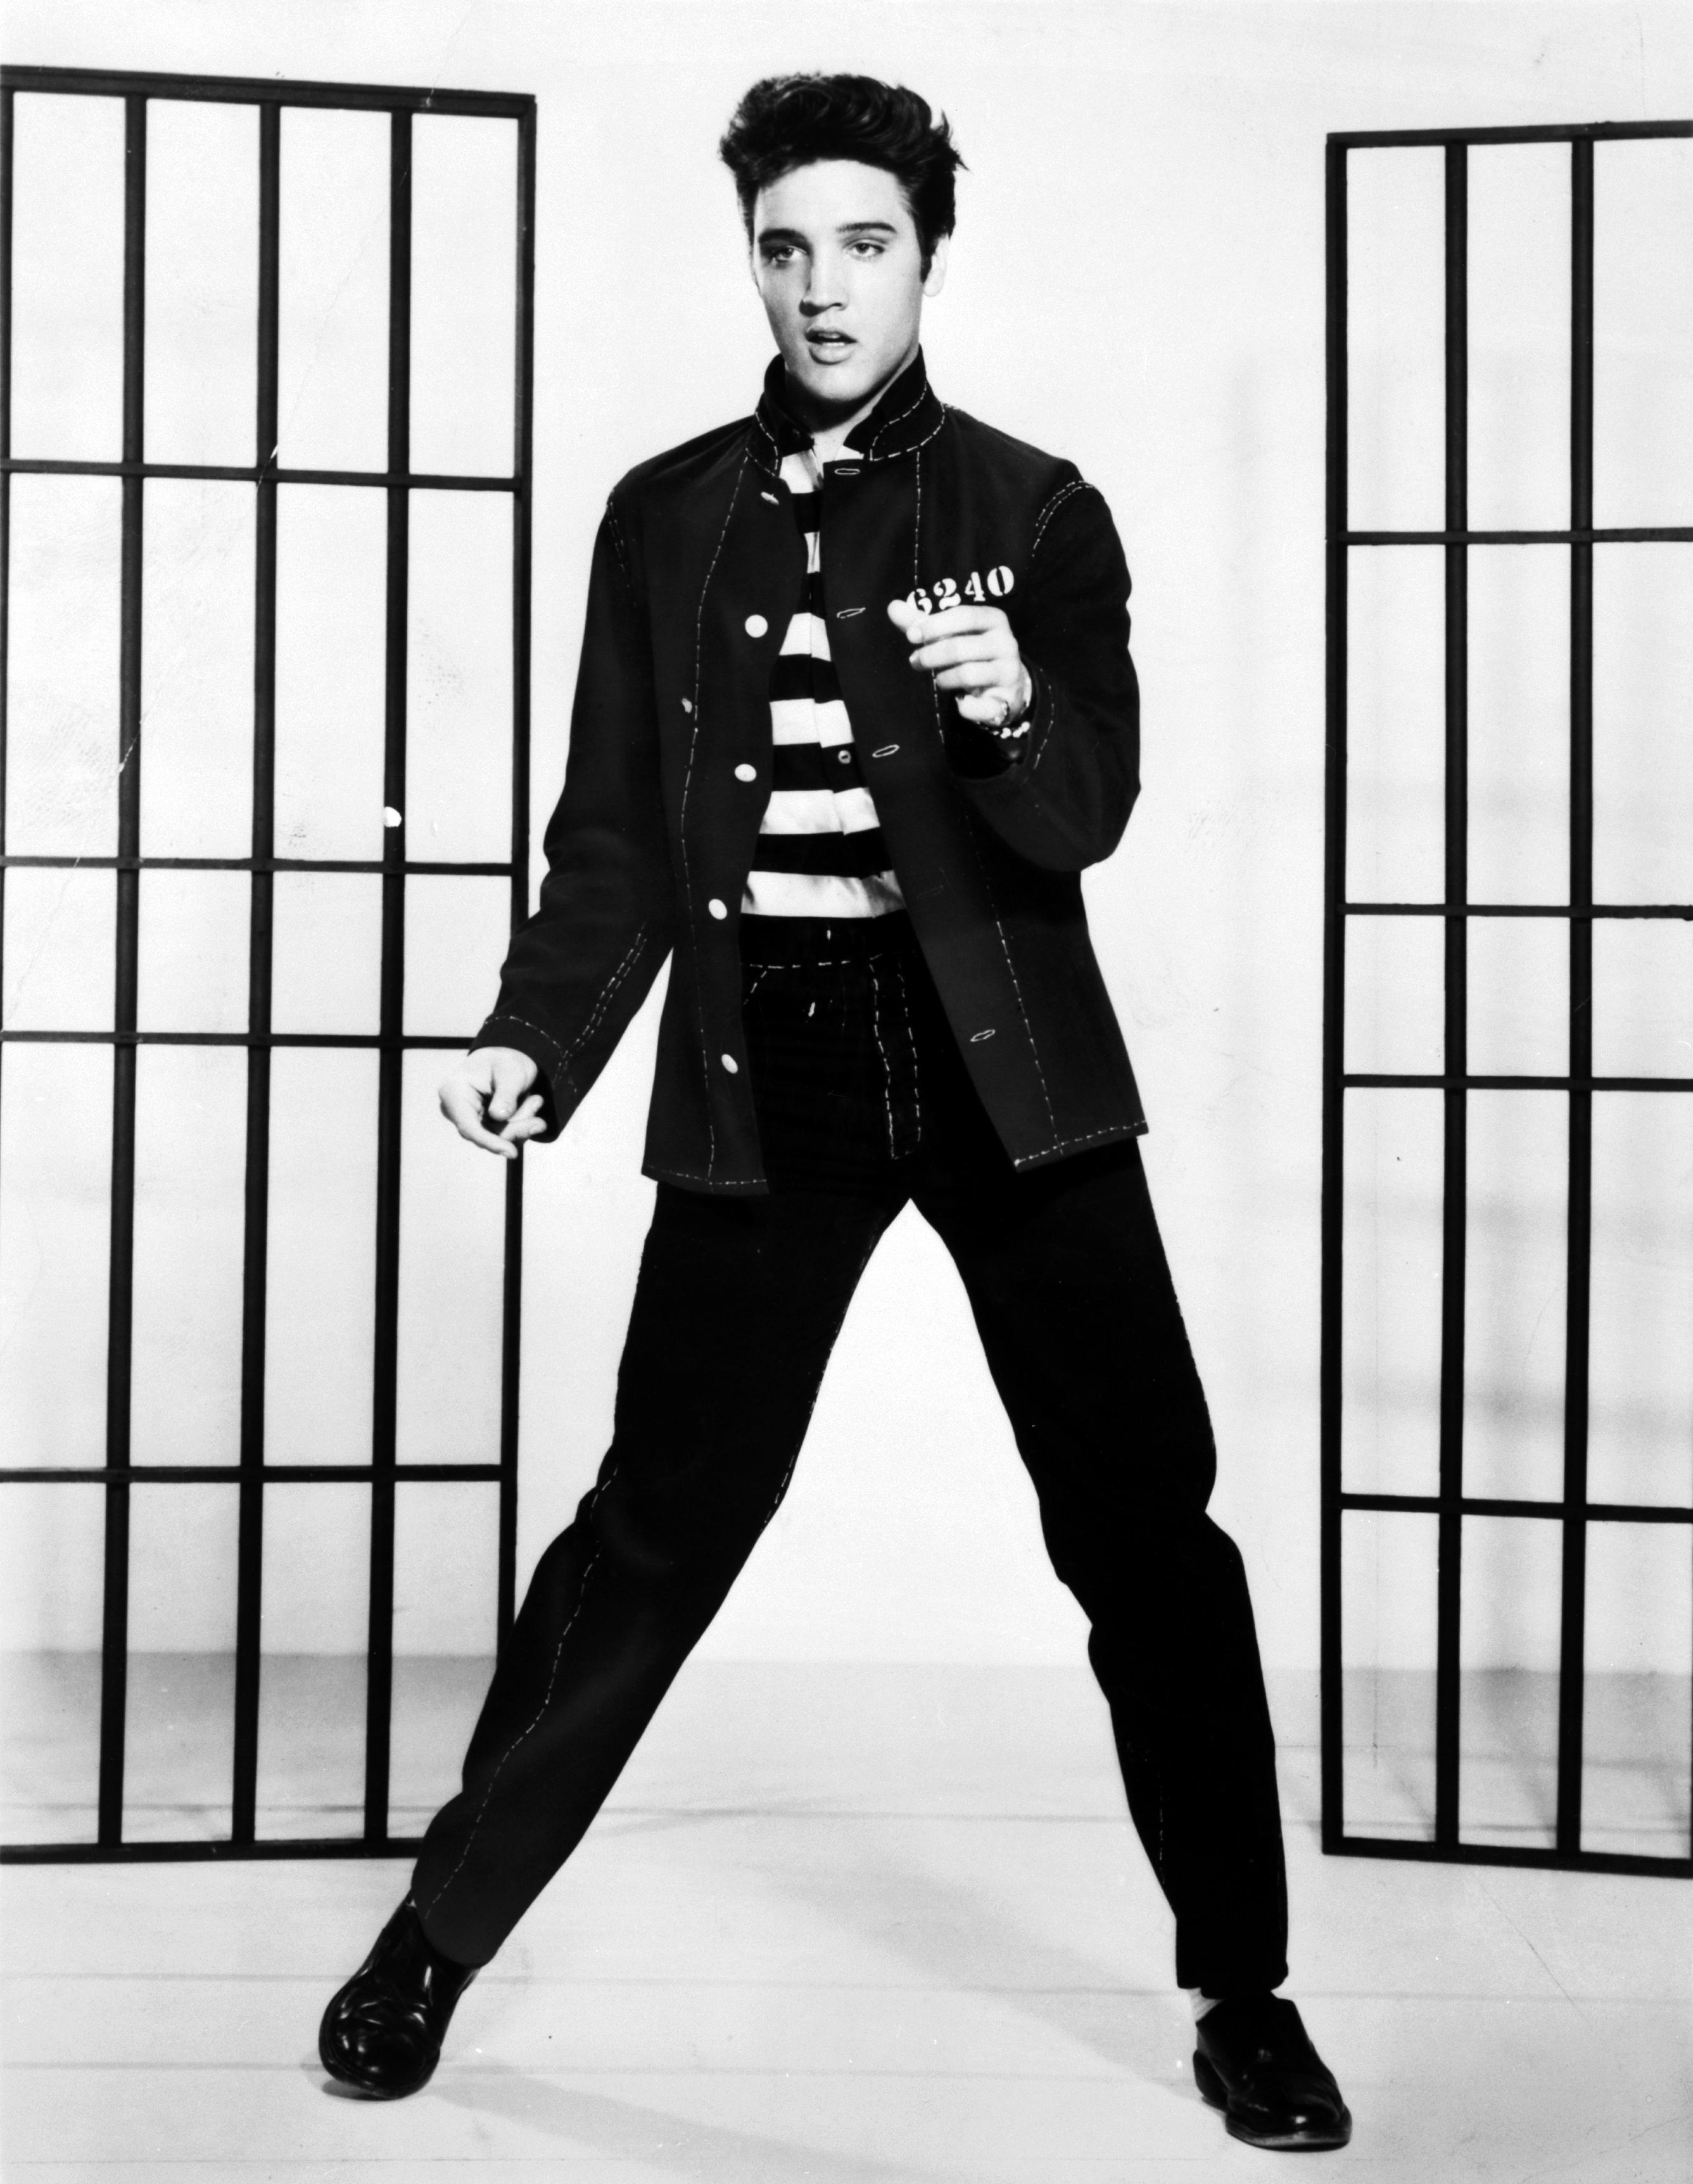 Photo Elvis Presley via Opendata BNF